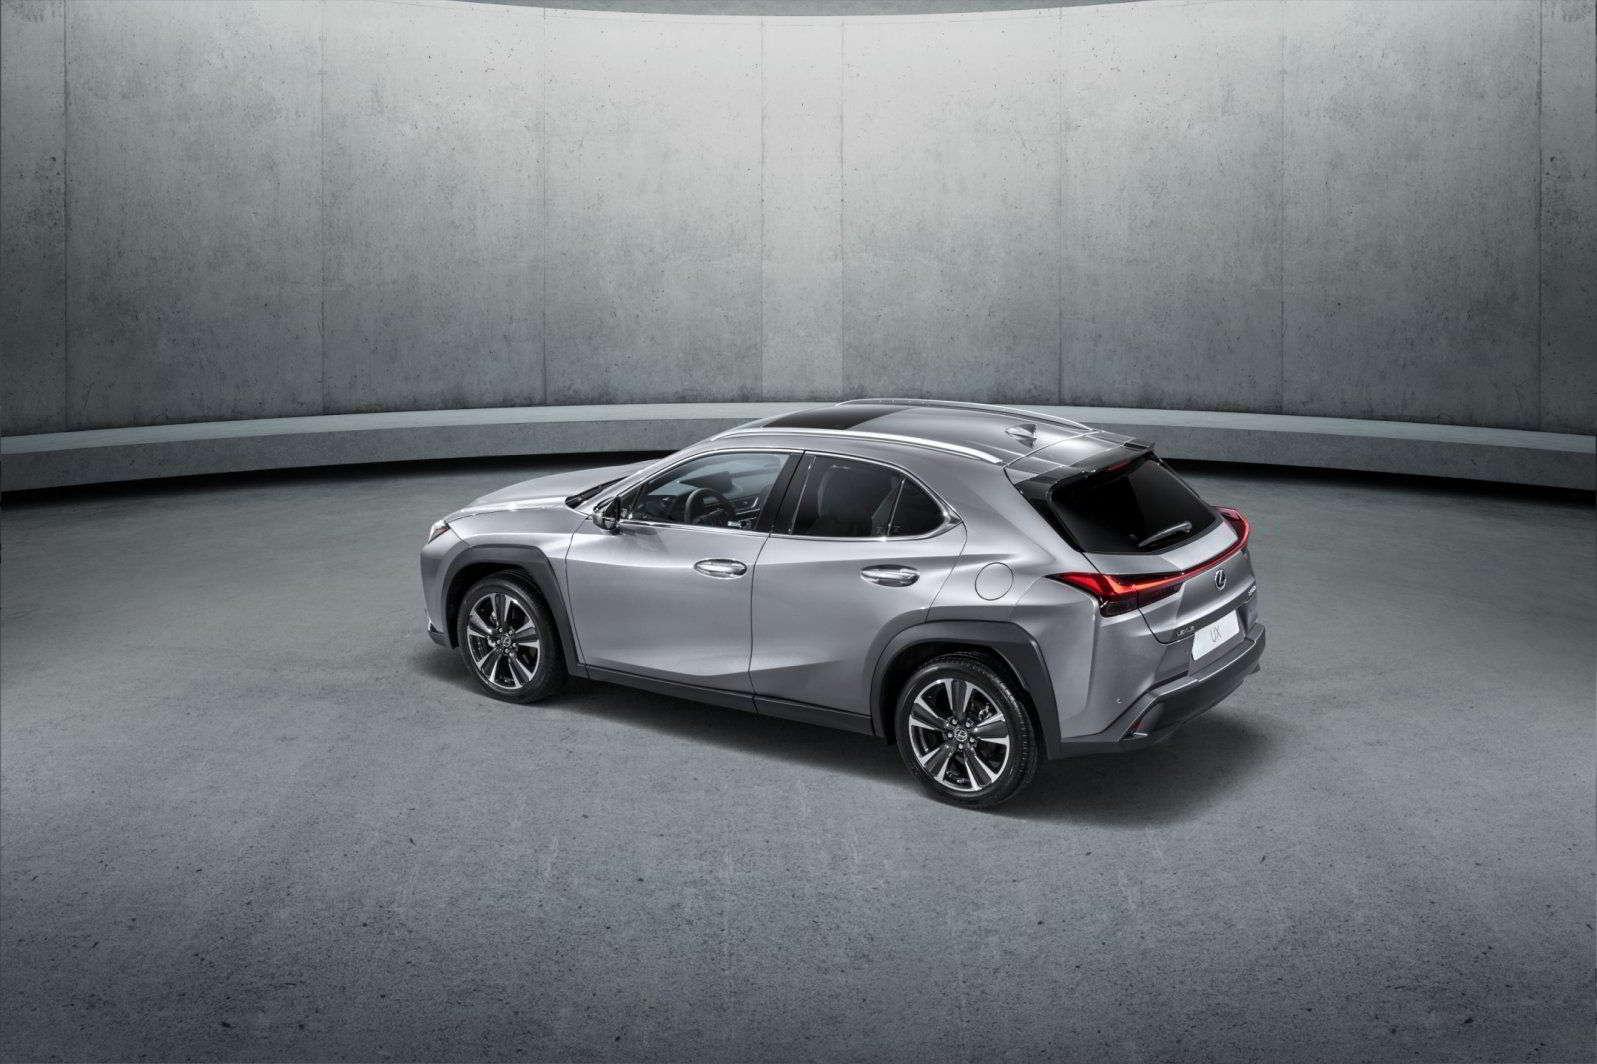 20 Concept of Ux Lexus 2020 Rumors with Ux Lexus 2020